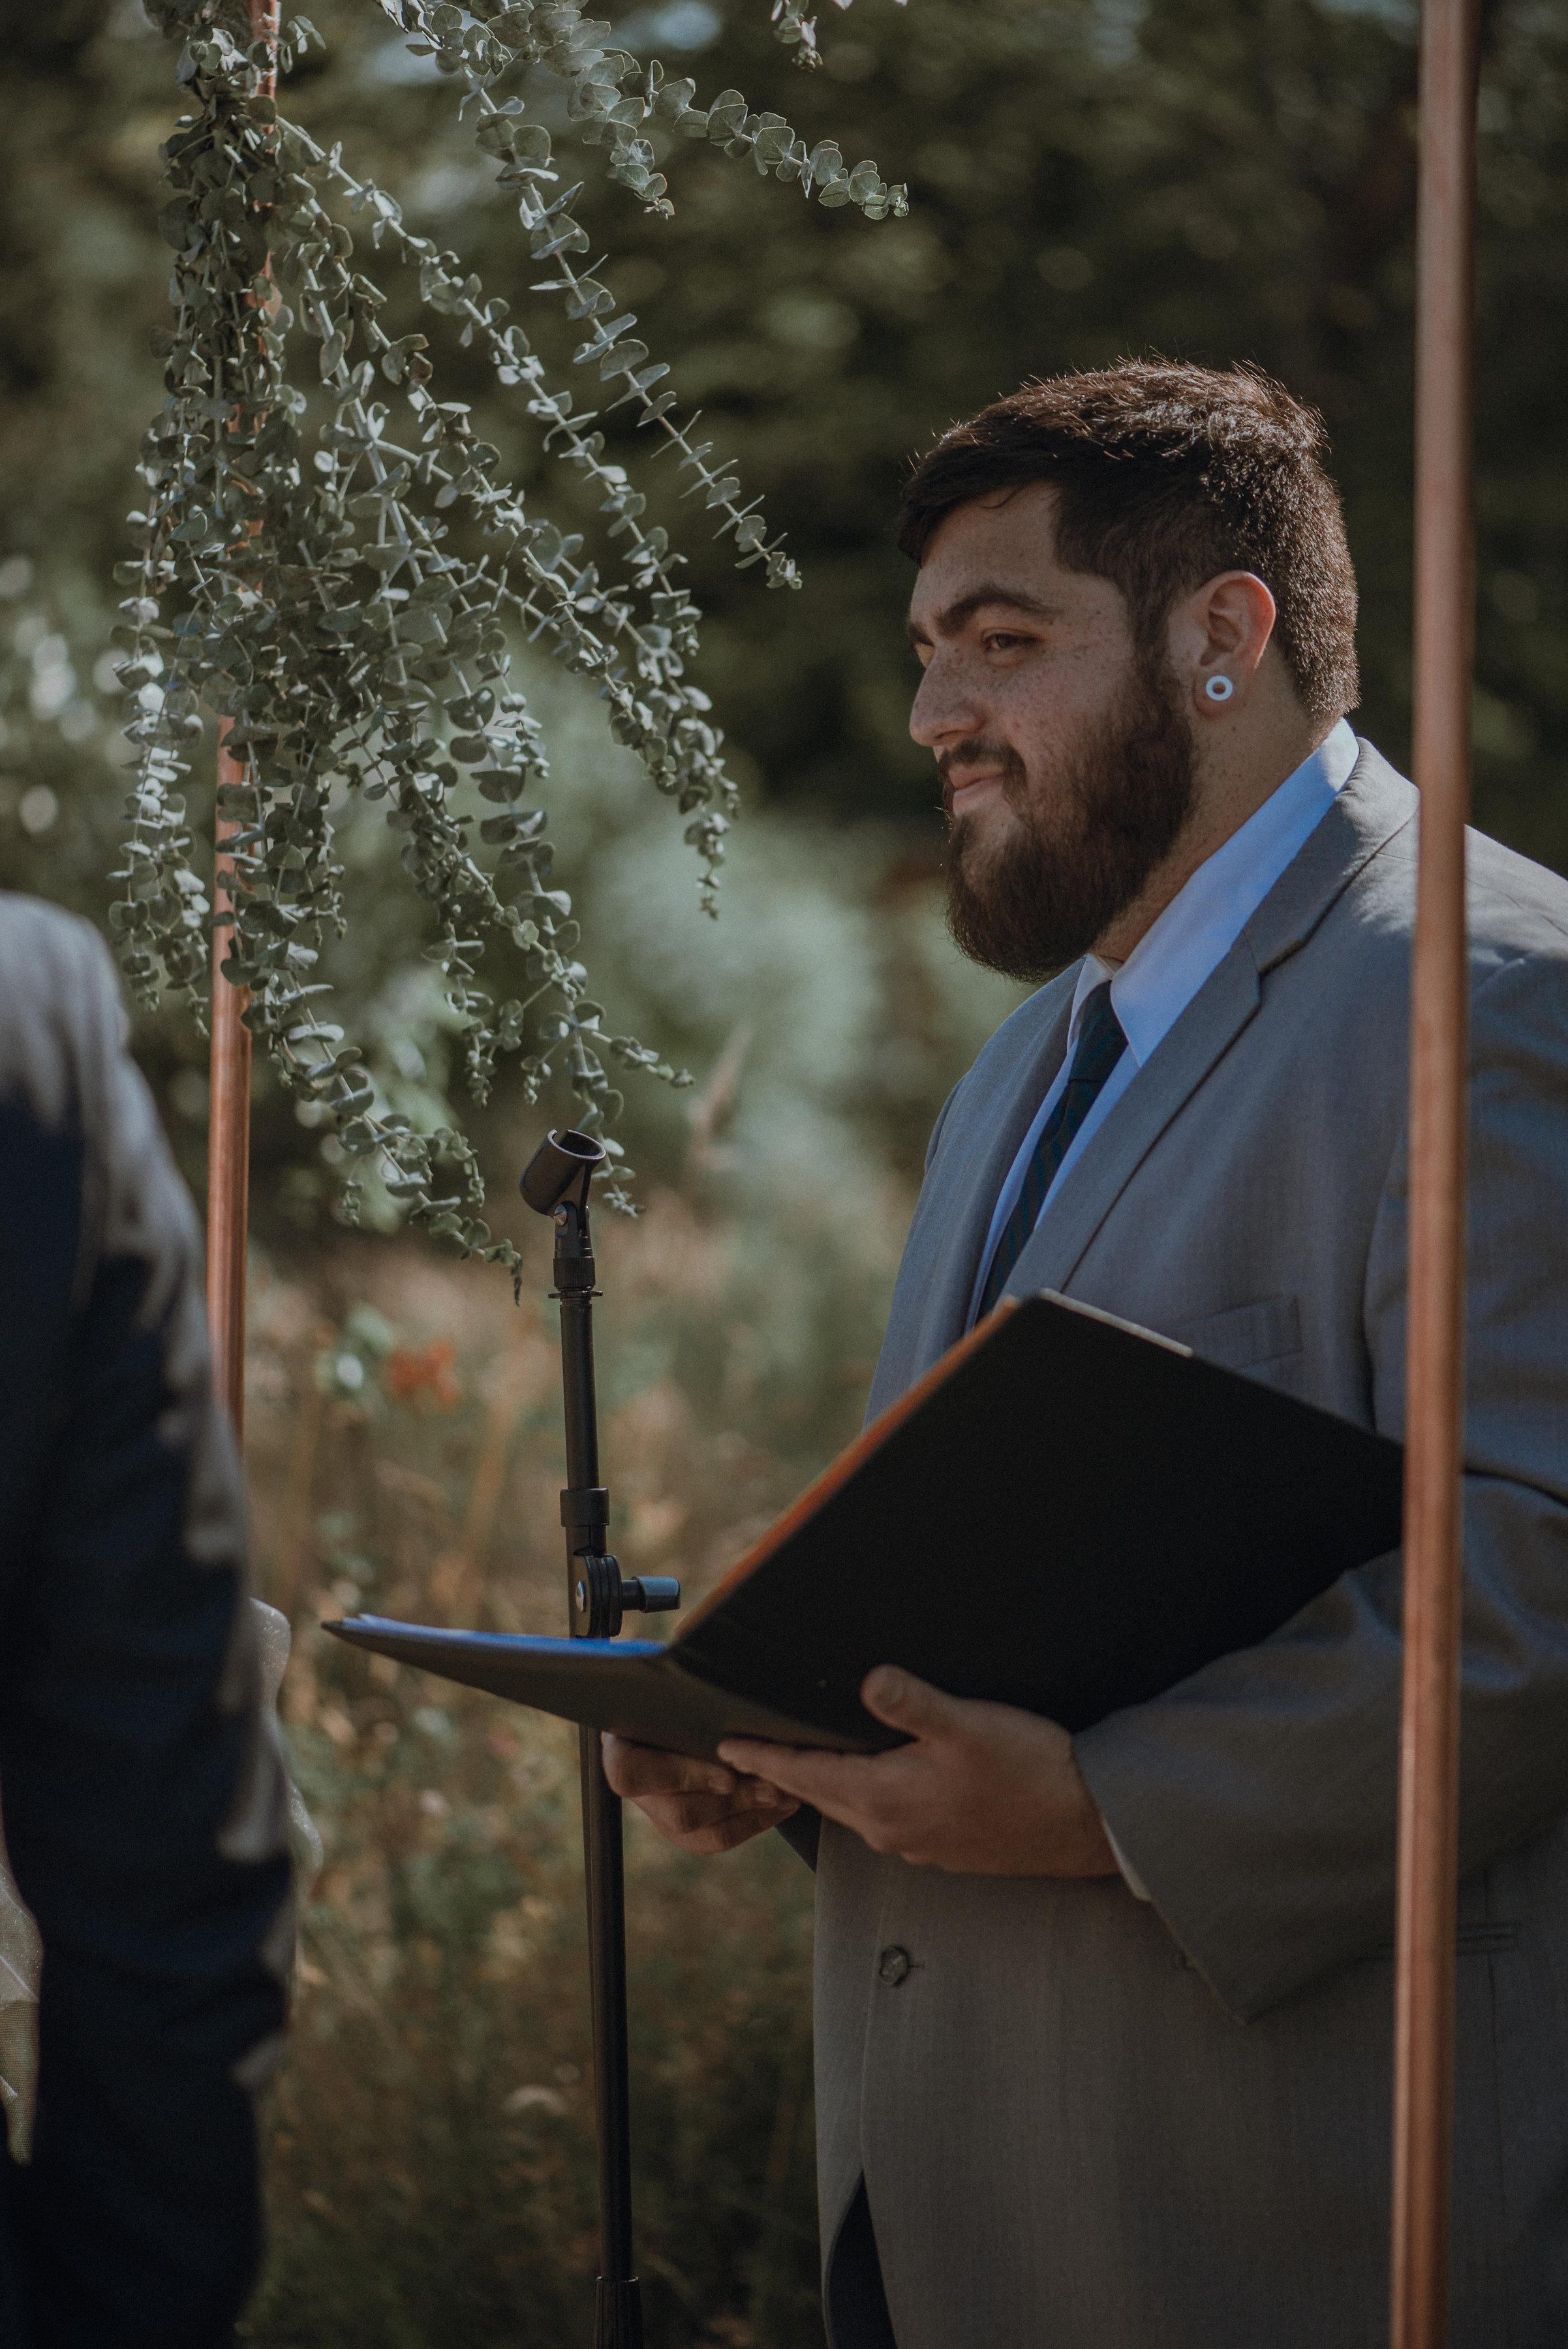 Lodges-at-Vashon-wedding27.jpg